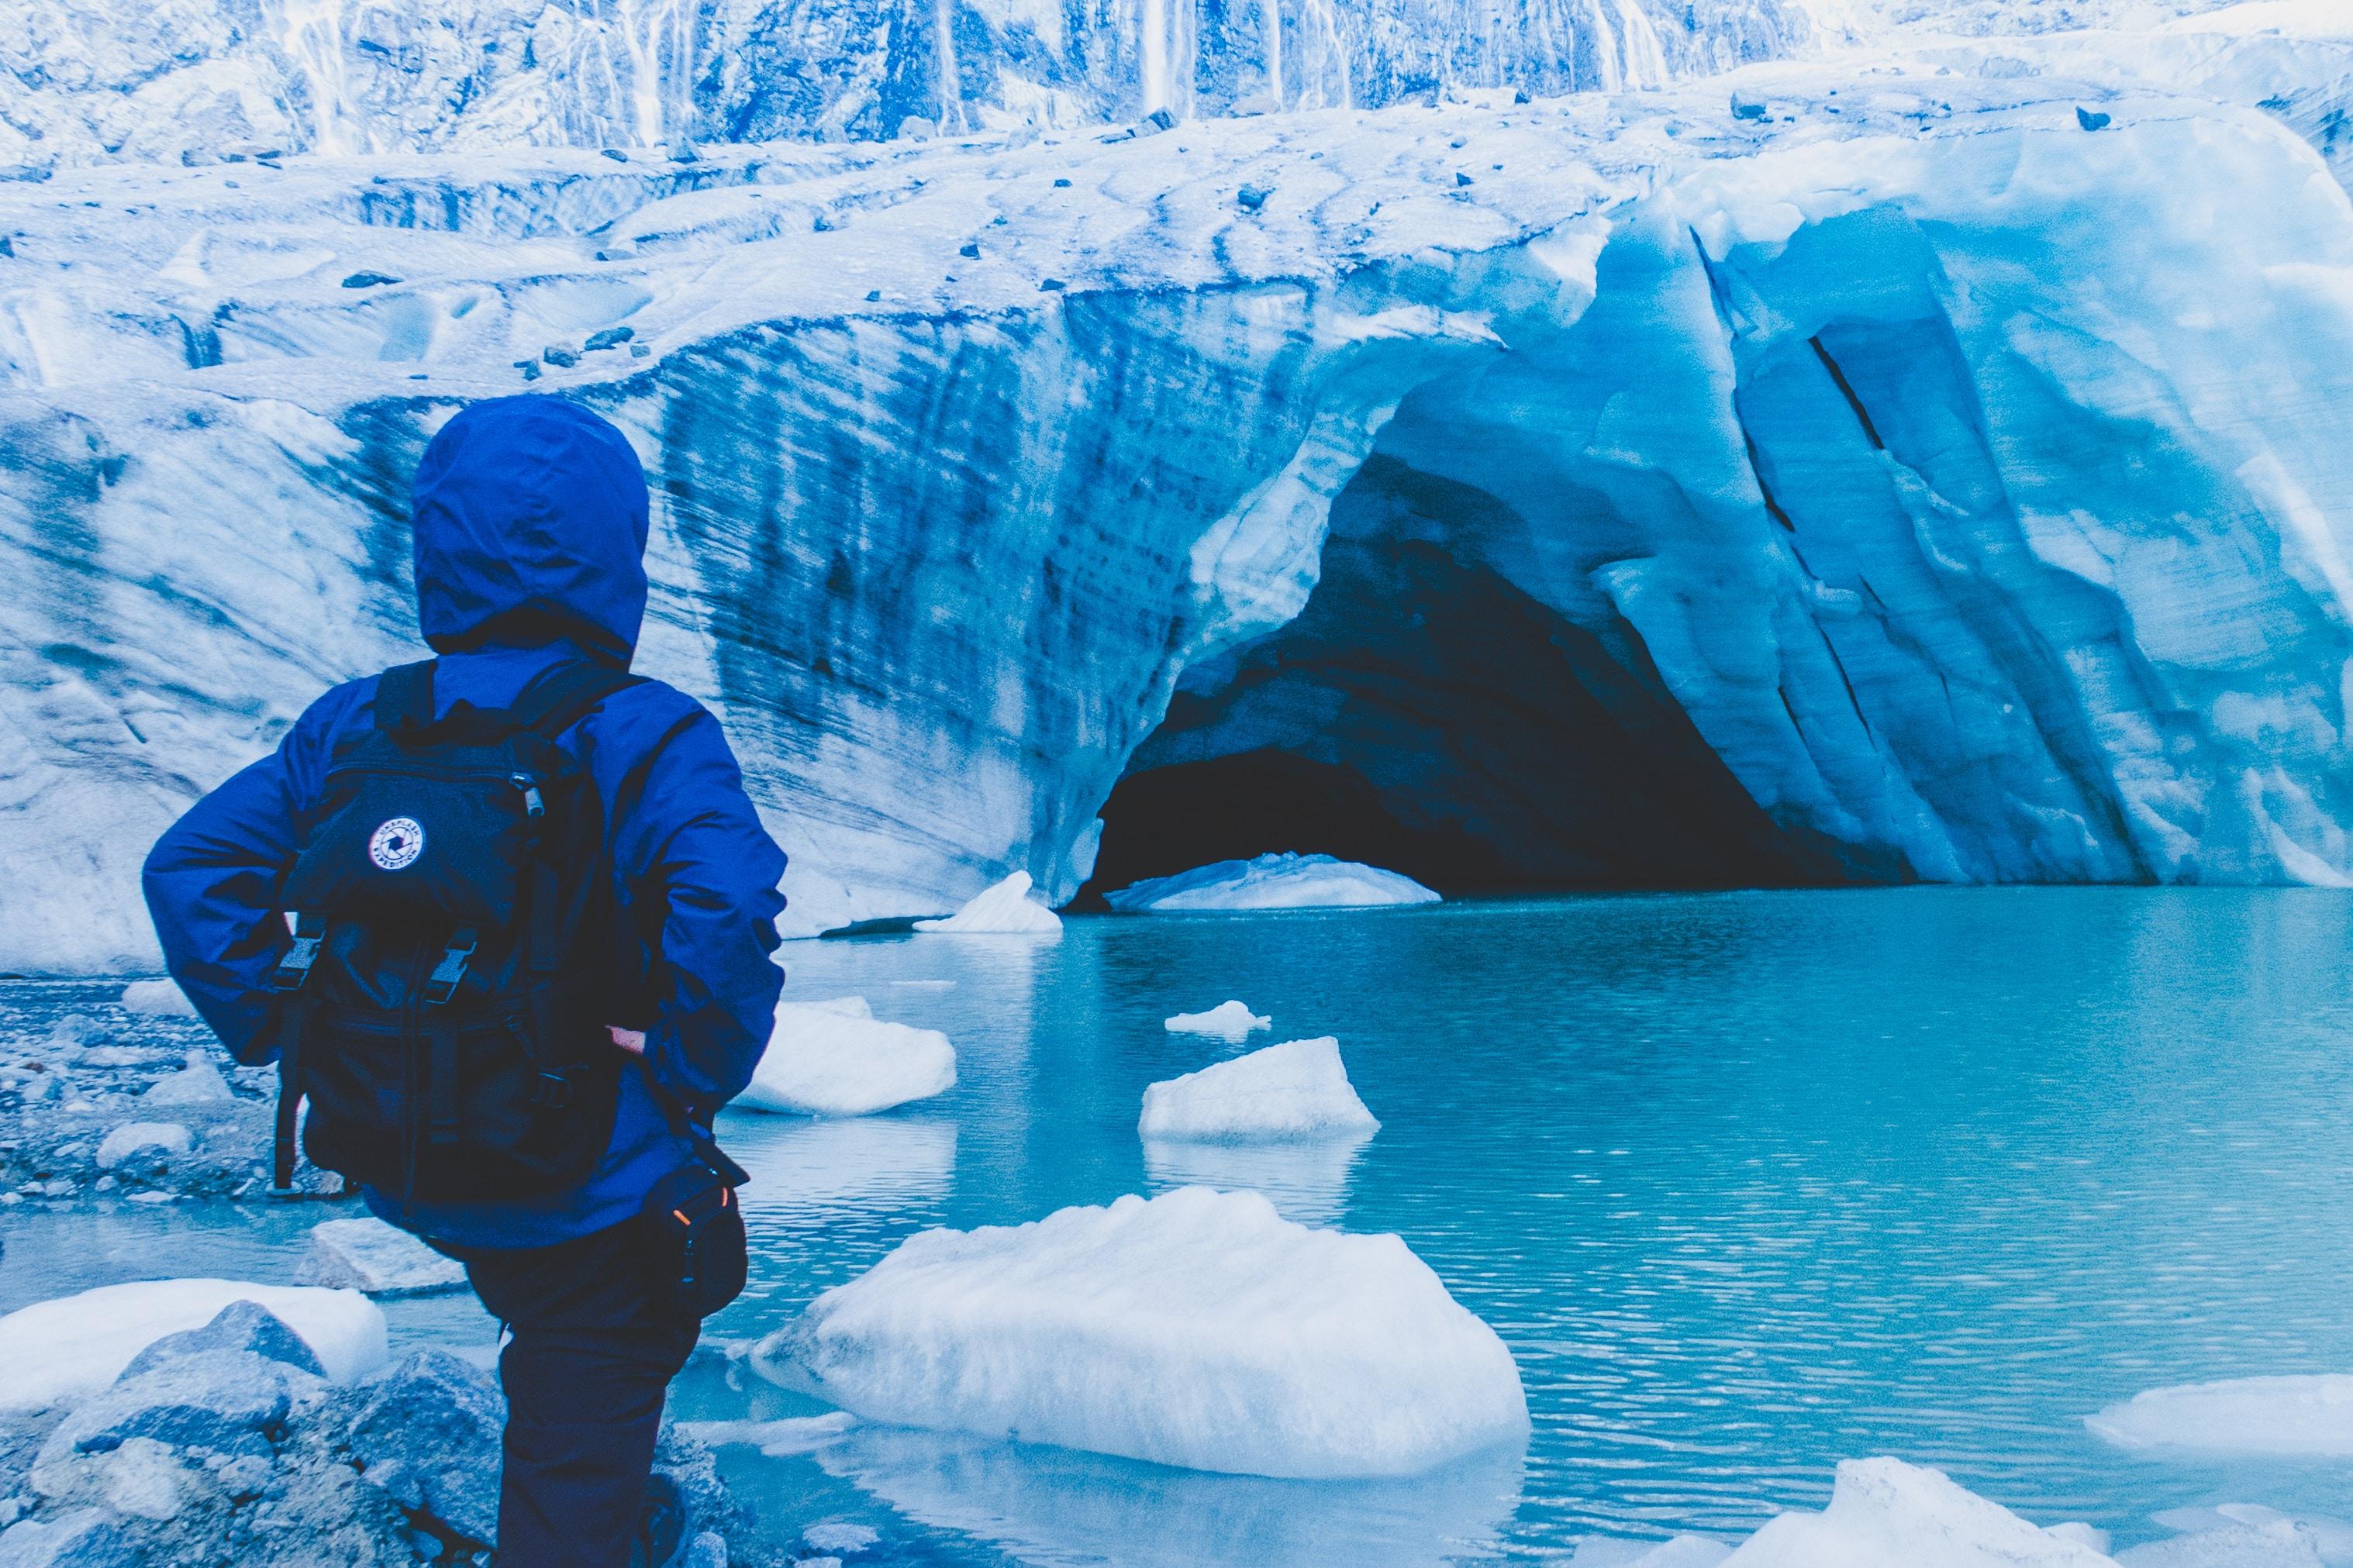 person wearing blue jacket standing near body of water